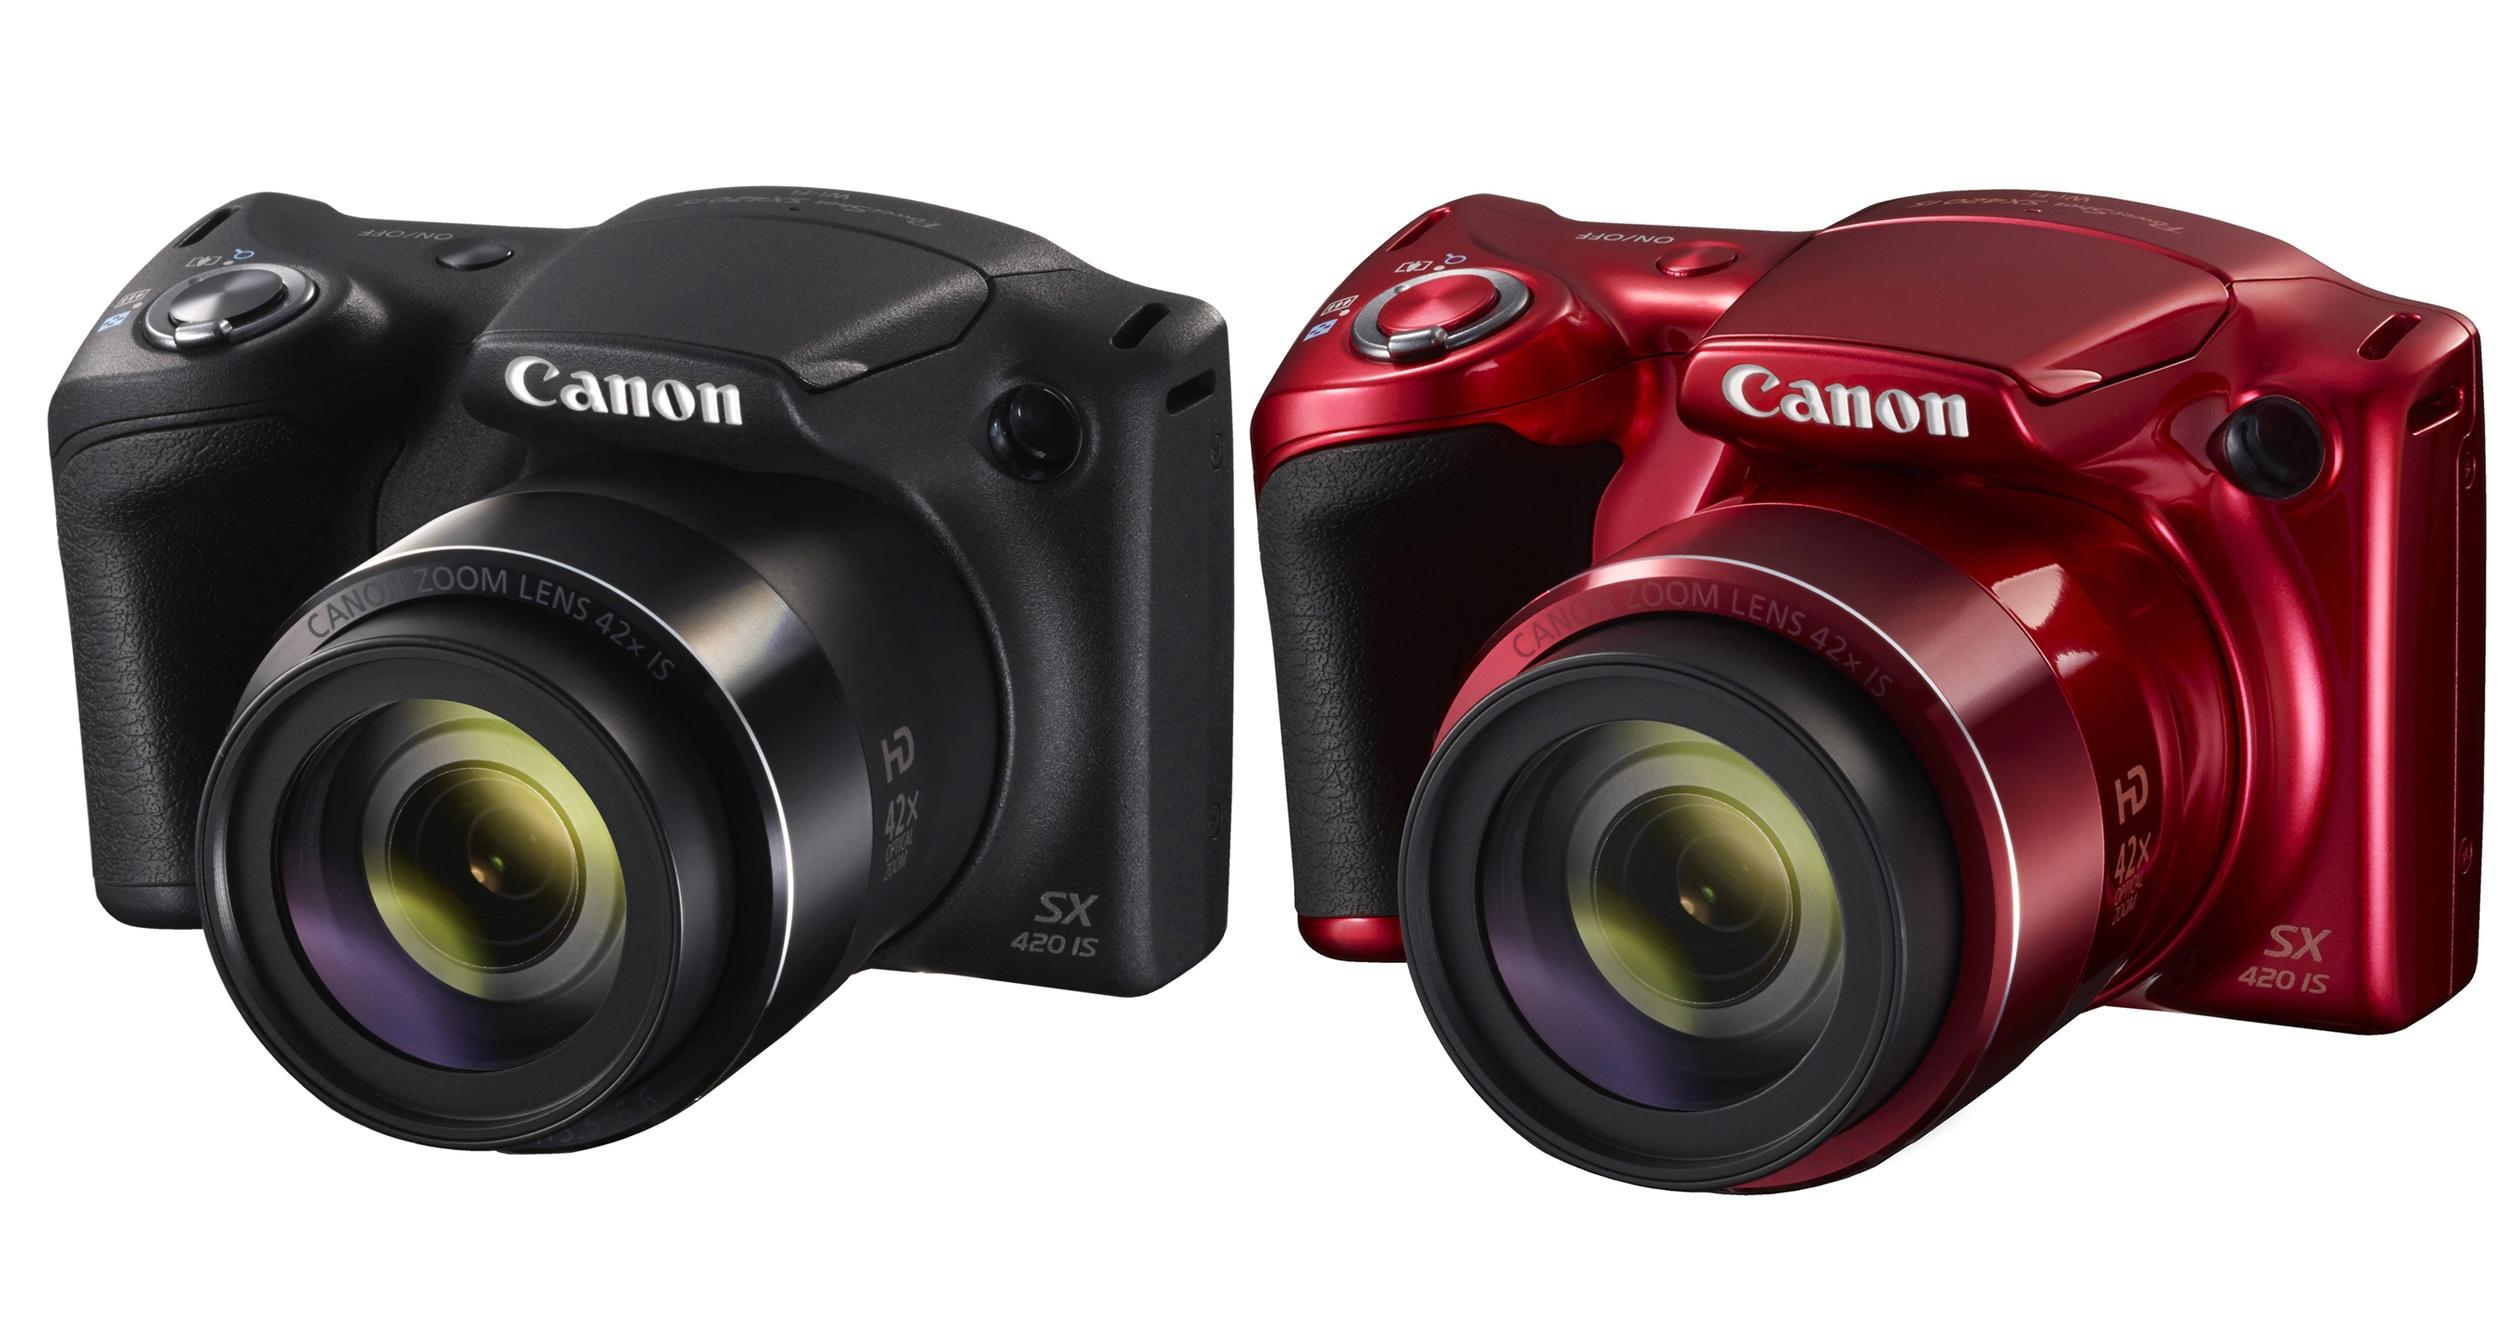 Canon Powershot SX420 IS: Μοντέρνος σχεδιασμός και ευελιξία